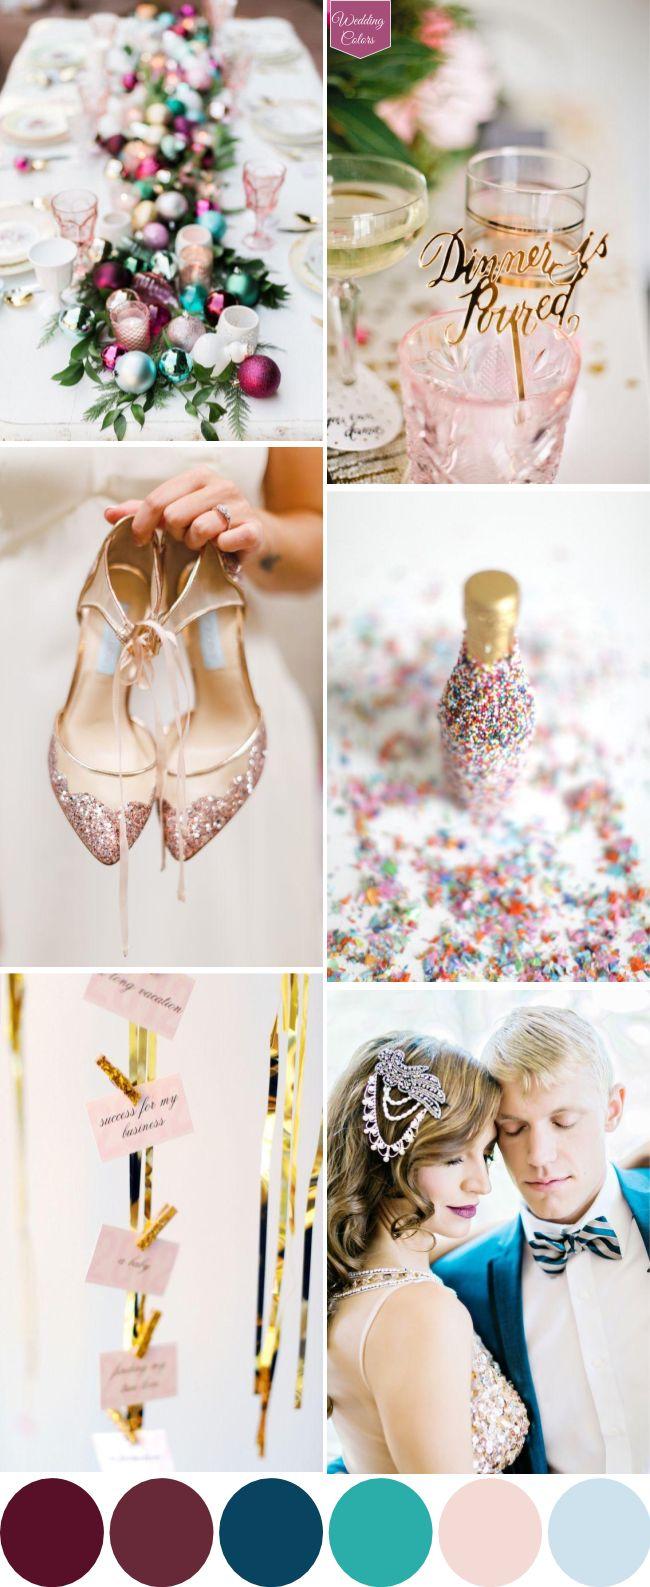 Best 25+ New years wedding ideas on Pinterest   New years eve ...